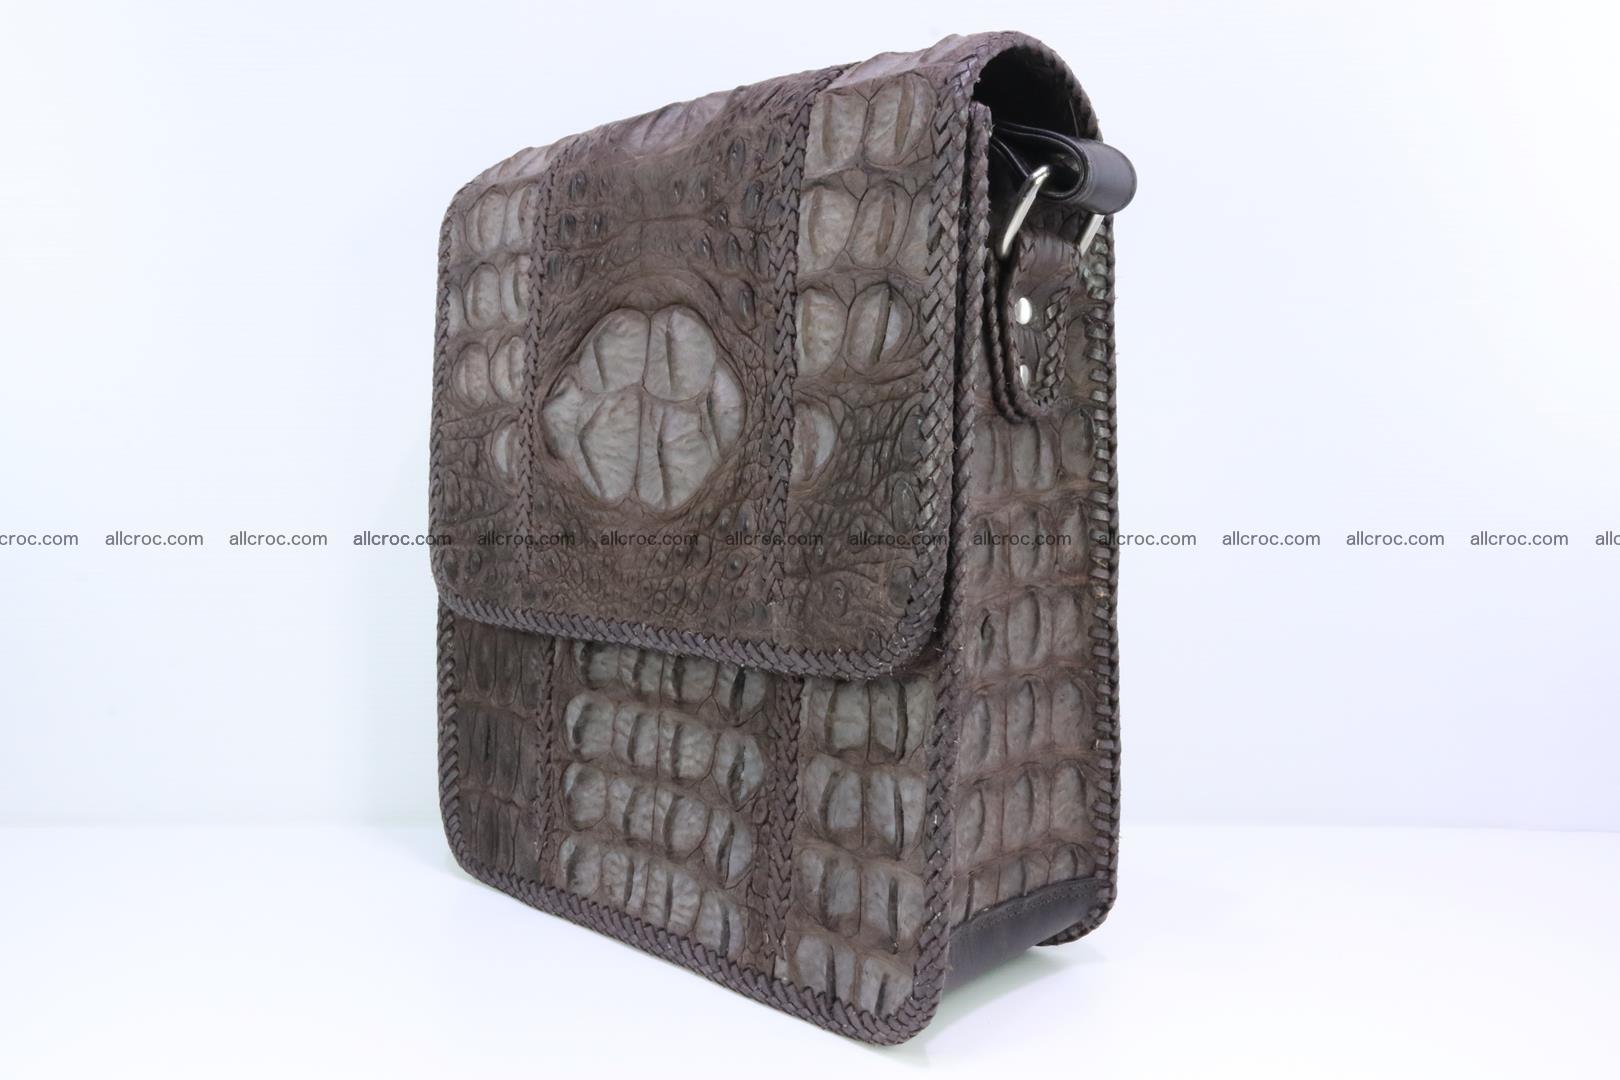 Сrocodile skin shoulder bag with braided edges 142 Foto 2